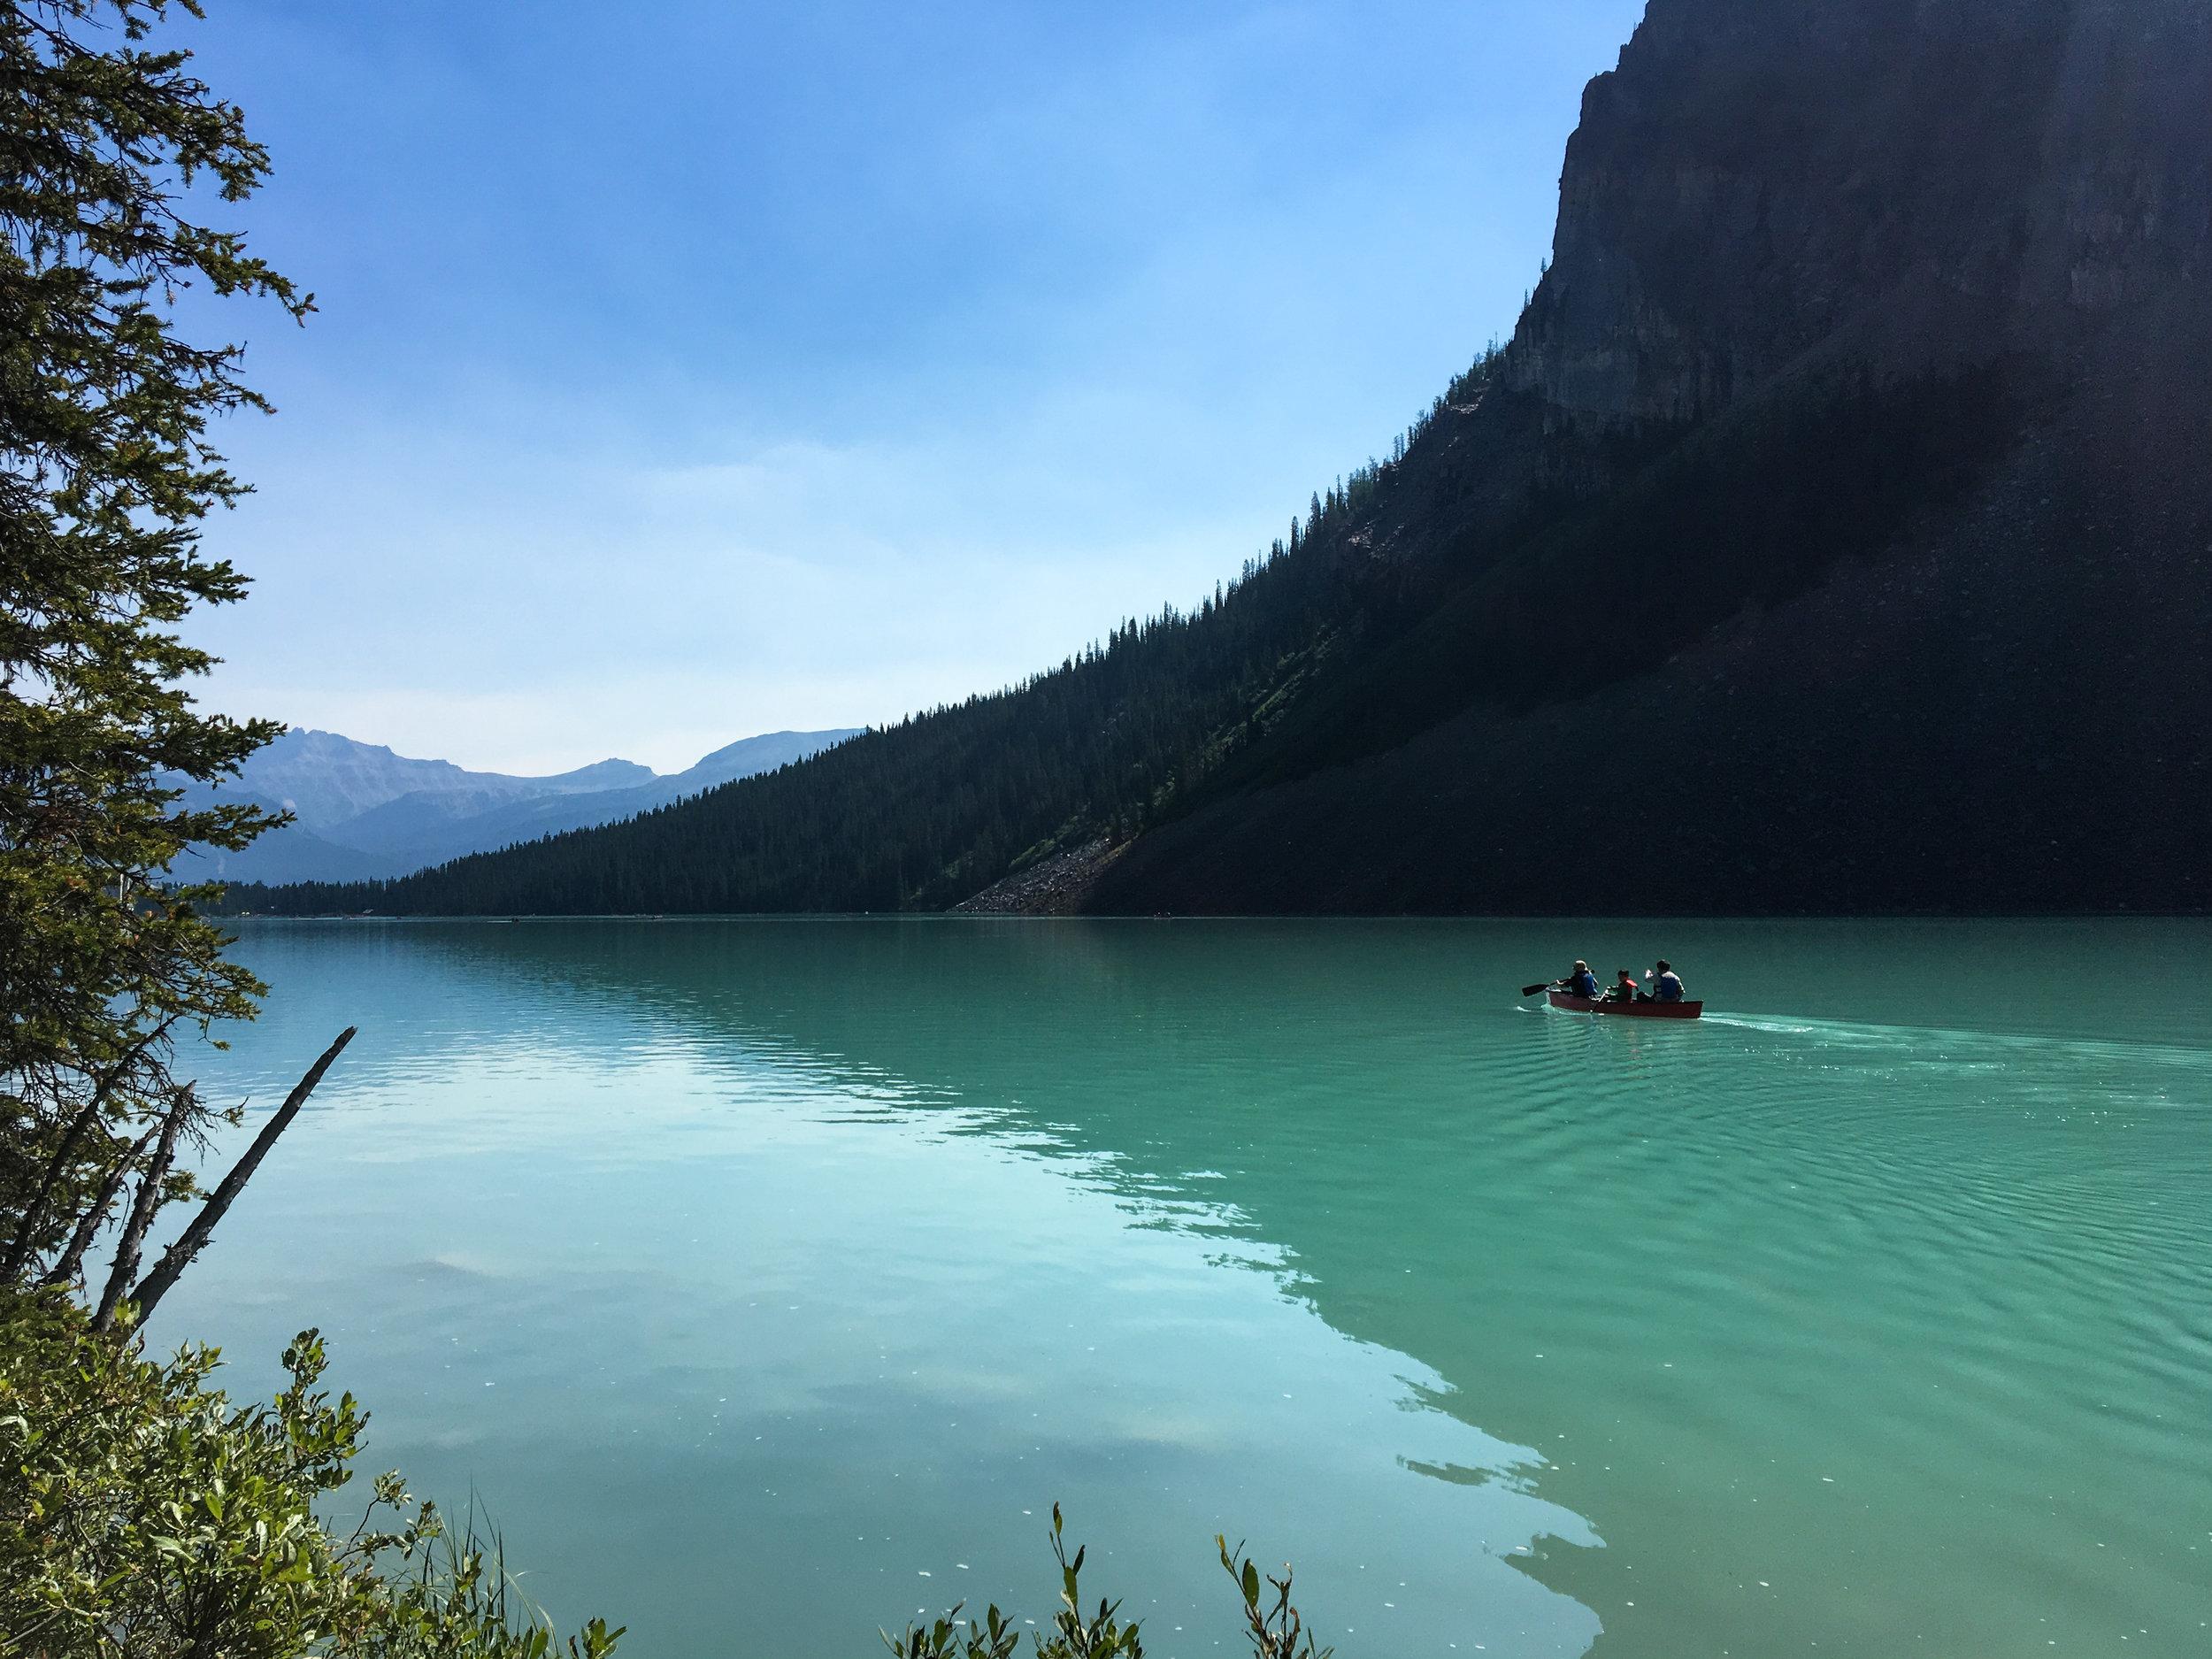 Canoe Rental Lake Louise